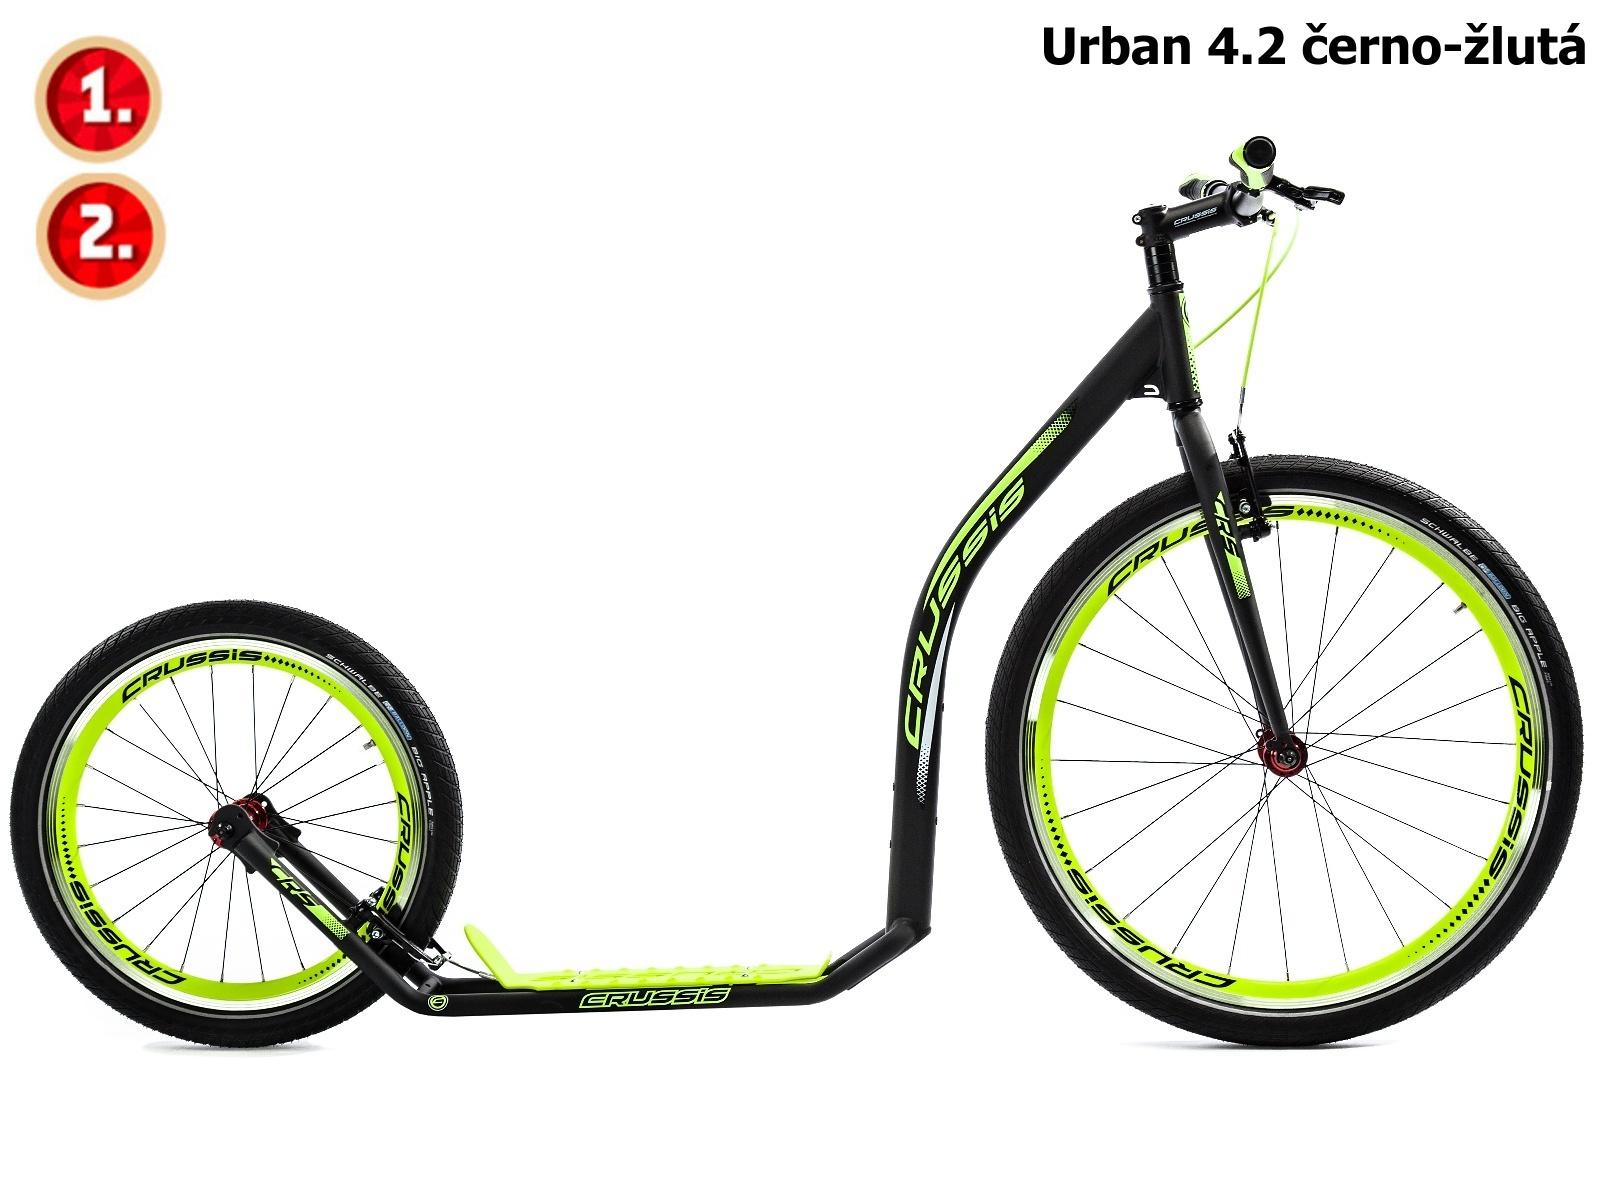 Koloběžka CRUSSIS Urban 4.2 černo-žlutá